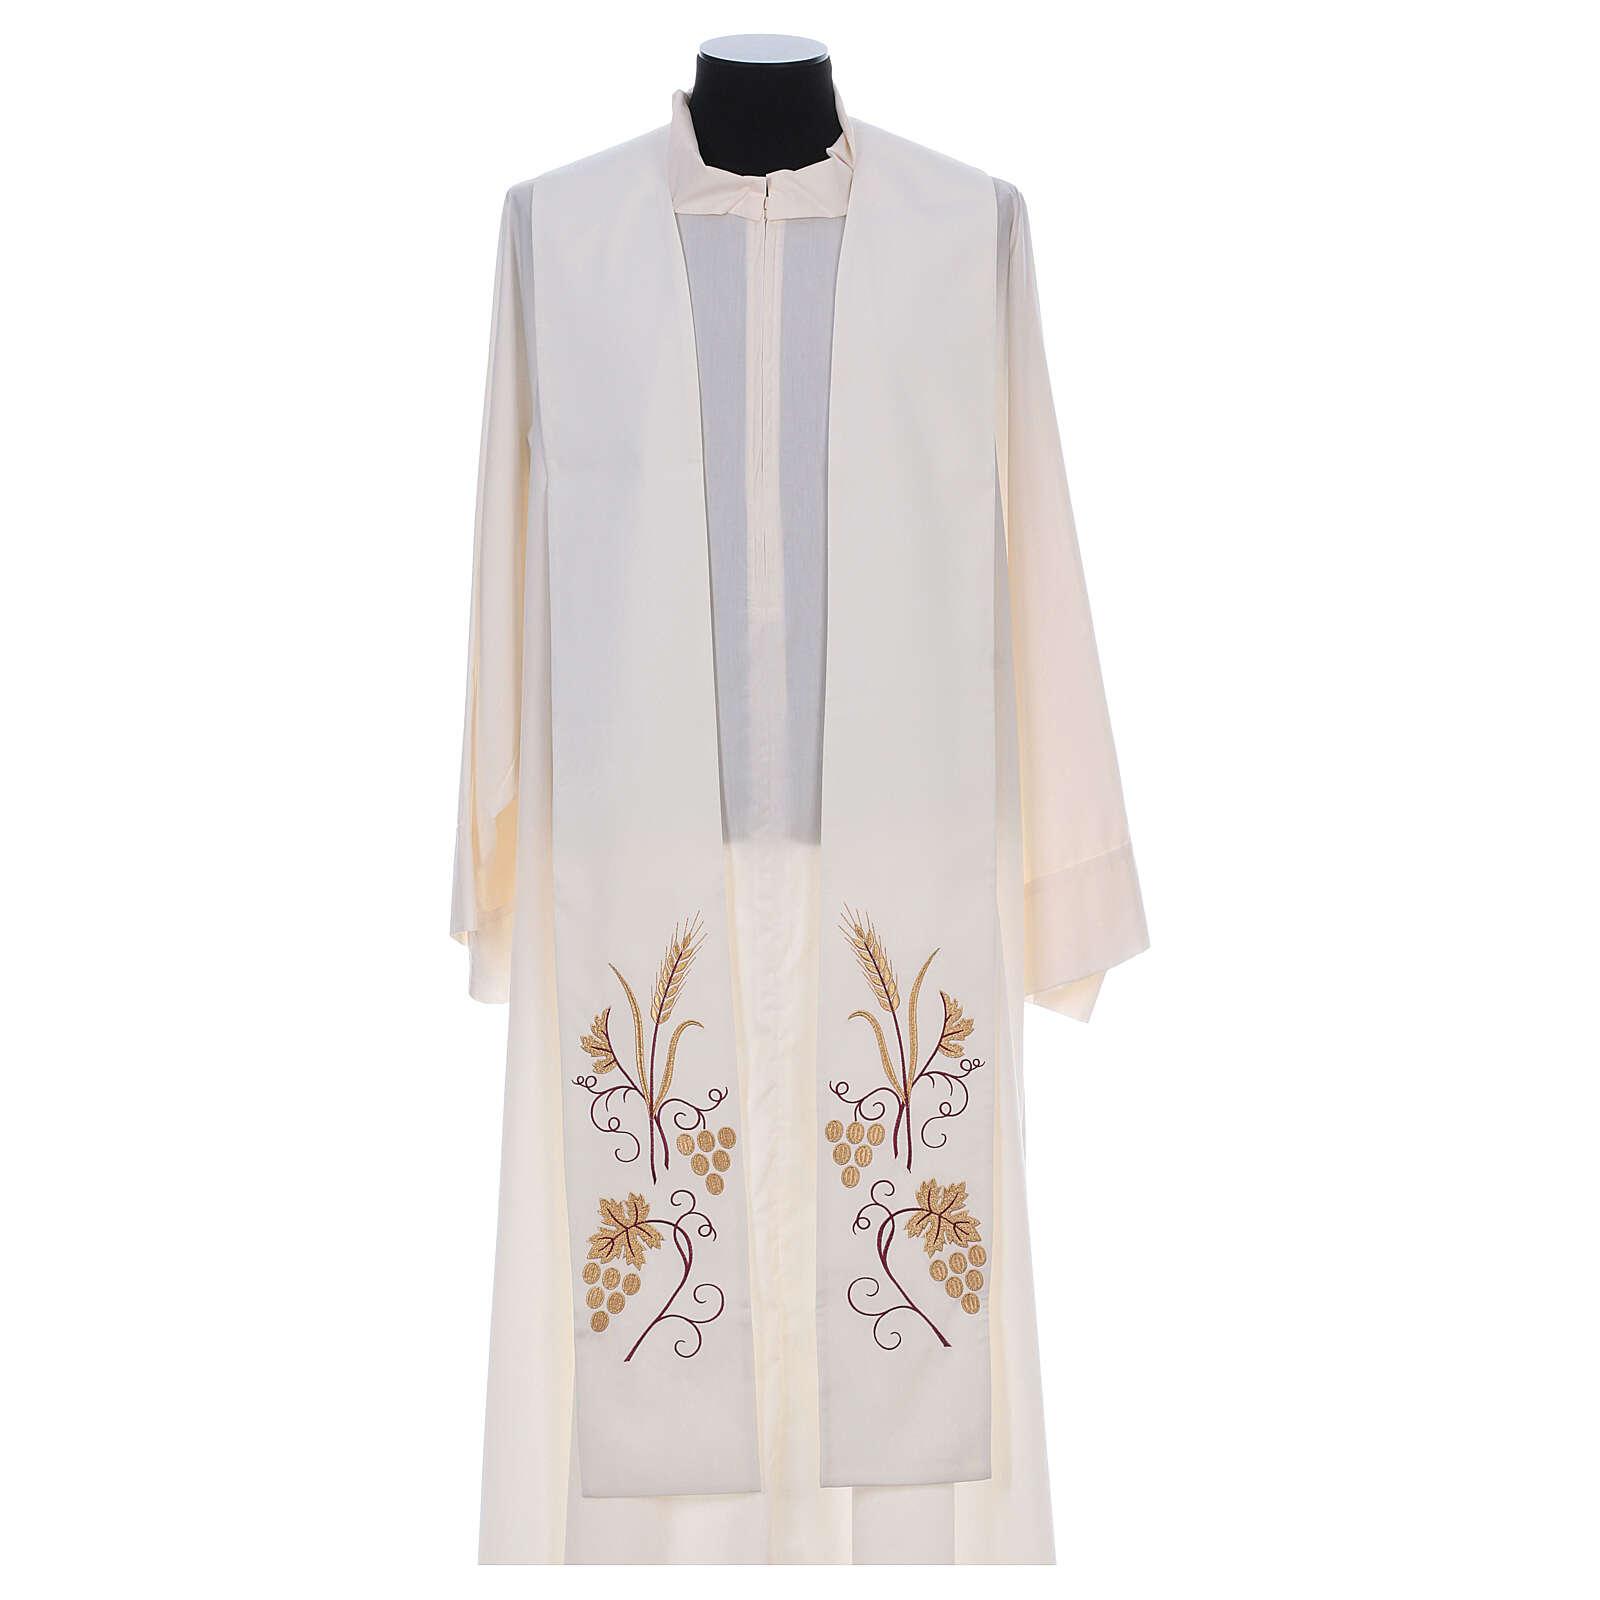 Stola sacerdotale spiga uva foglia ricamo dorato 4